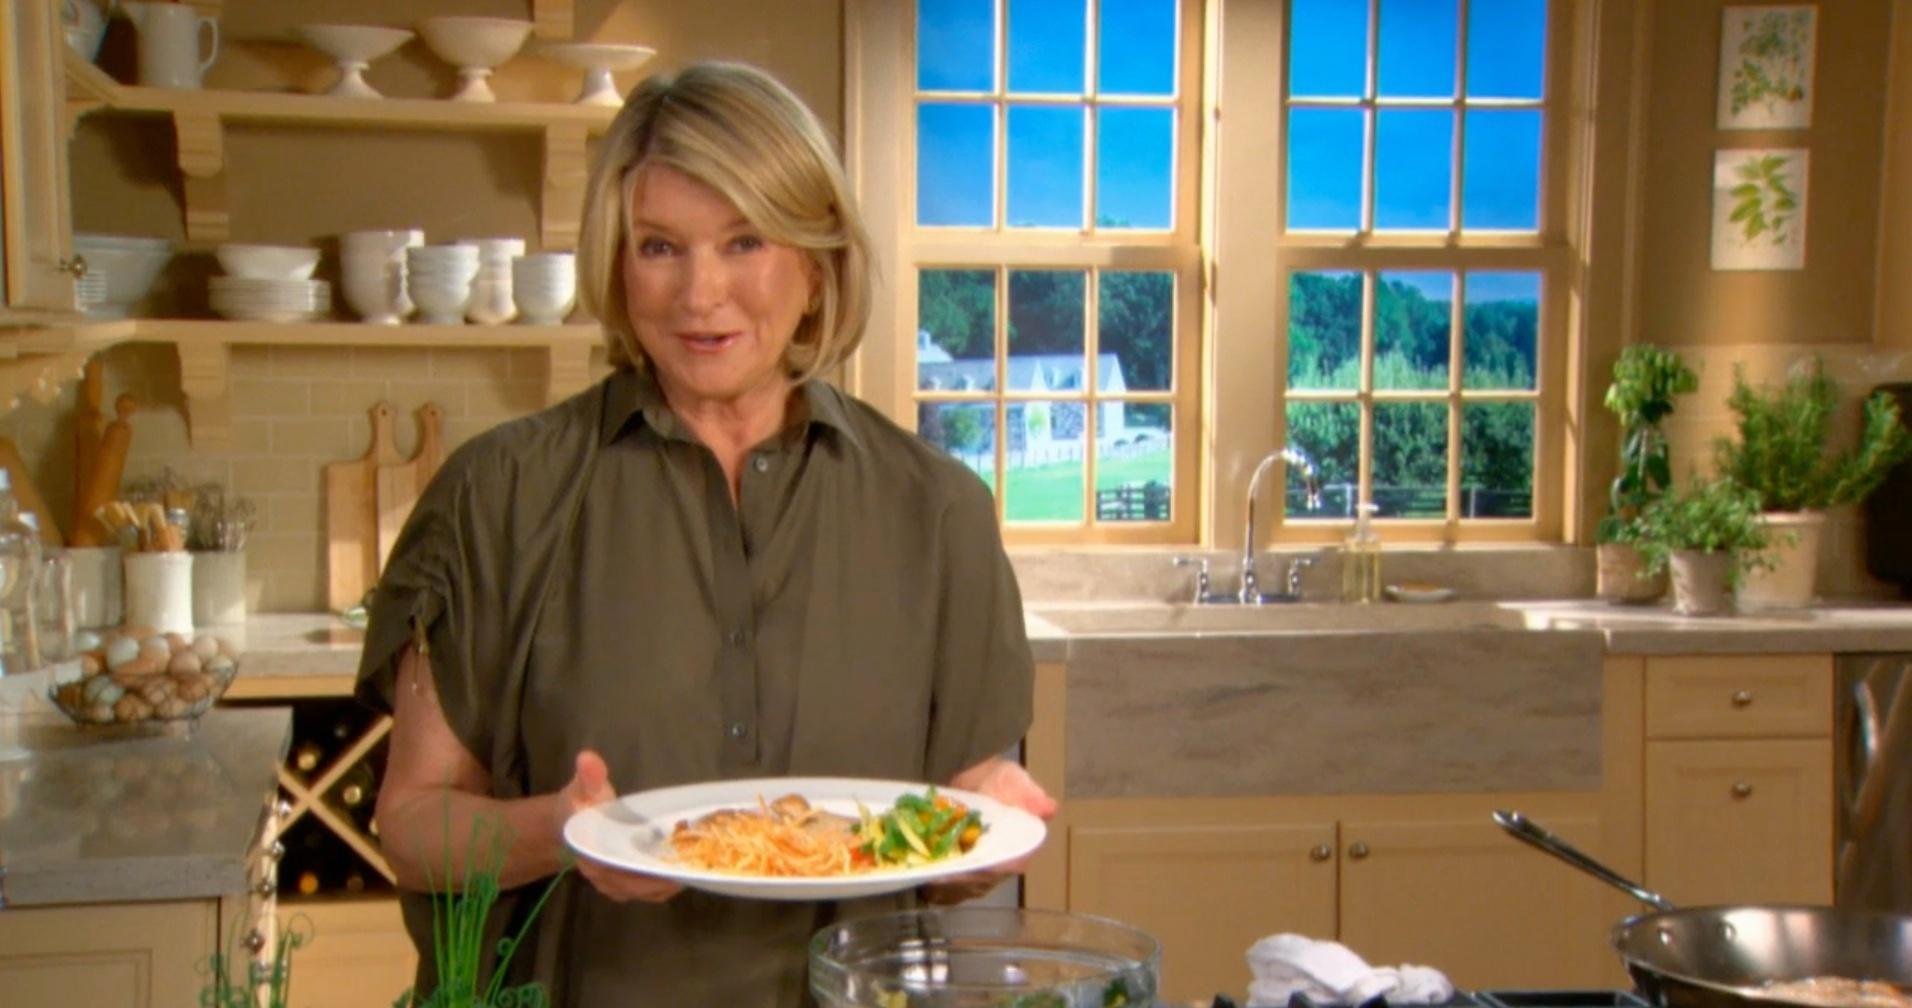 ... Sizzle   Watch Martha Stewart's Cooking School Online   PBS Video: video.pbs.org/video/2365145540